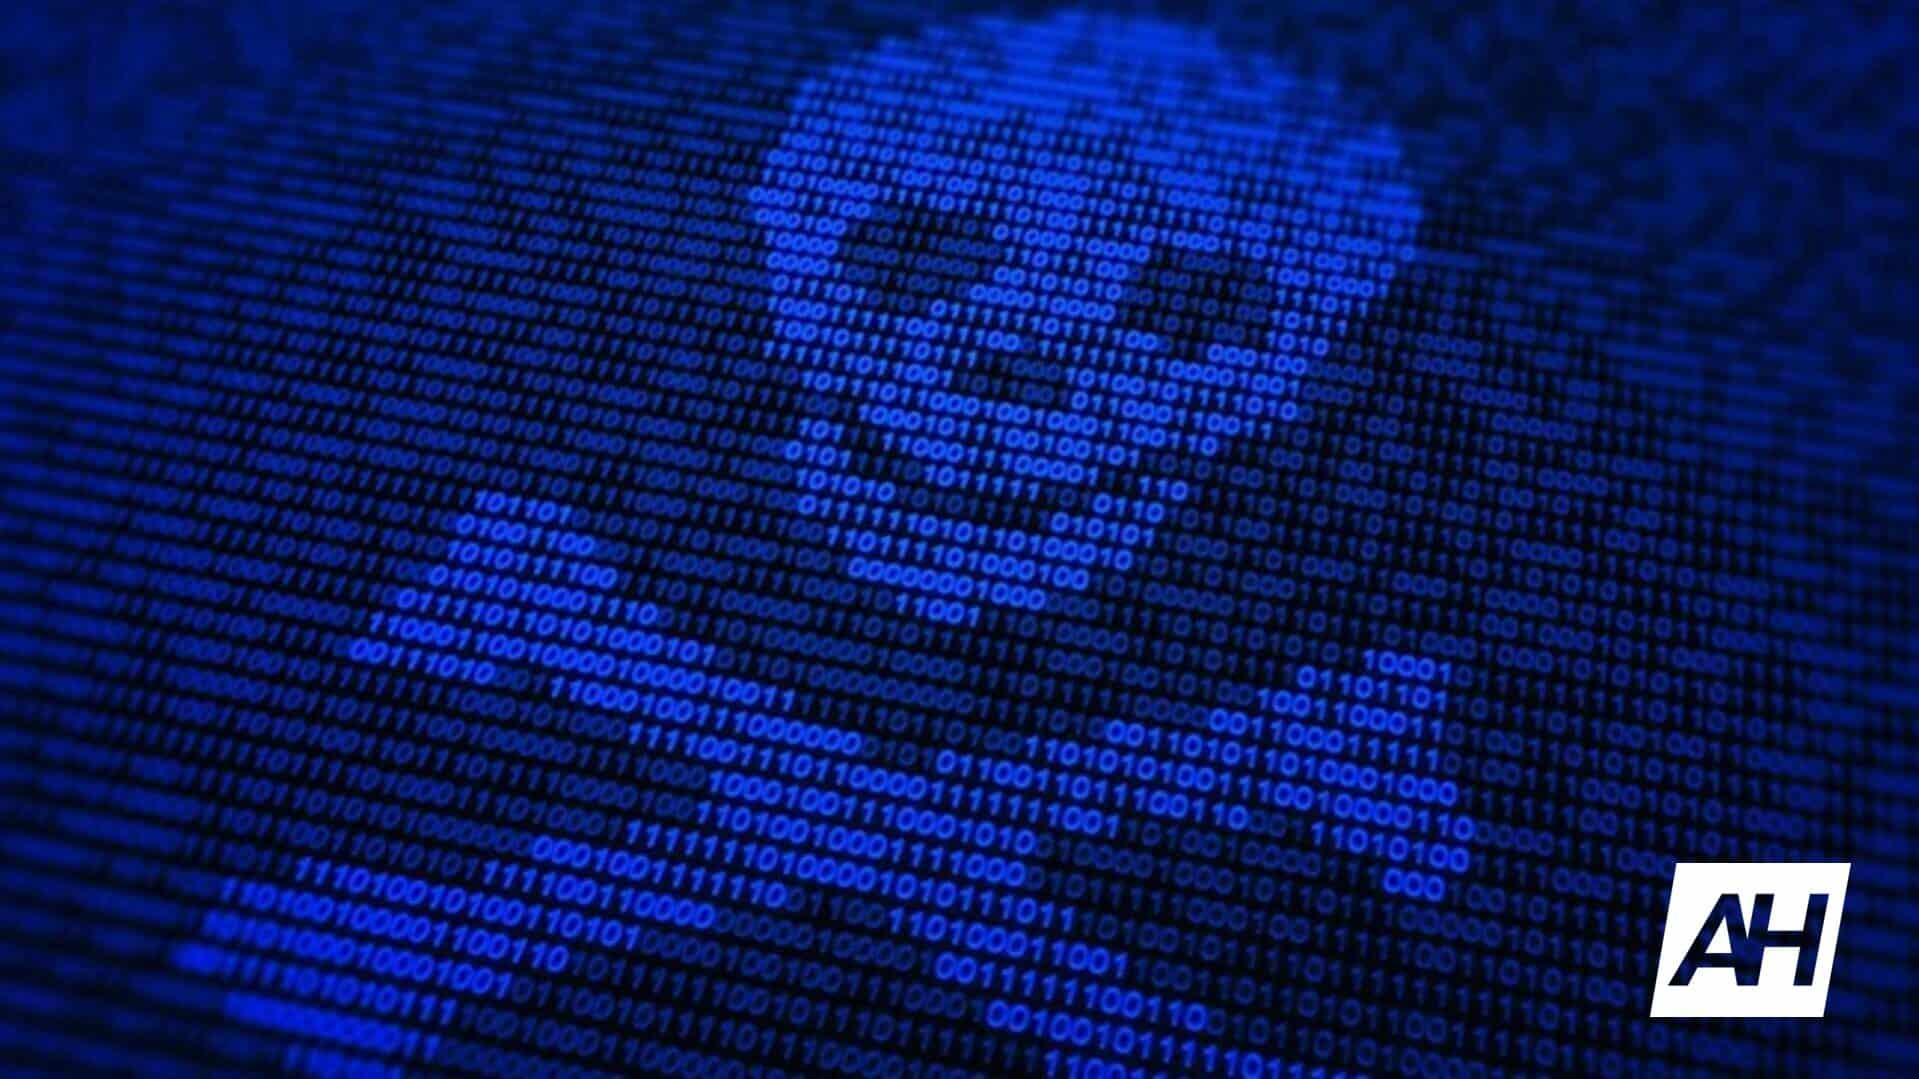 AH Malware encryption data theft virus NEW AH